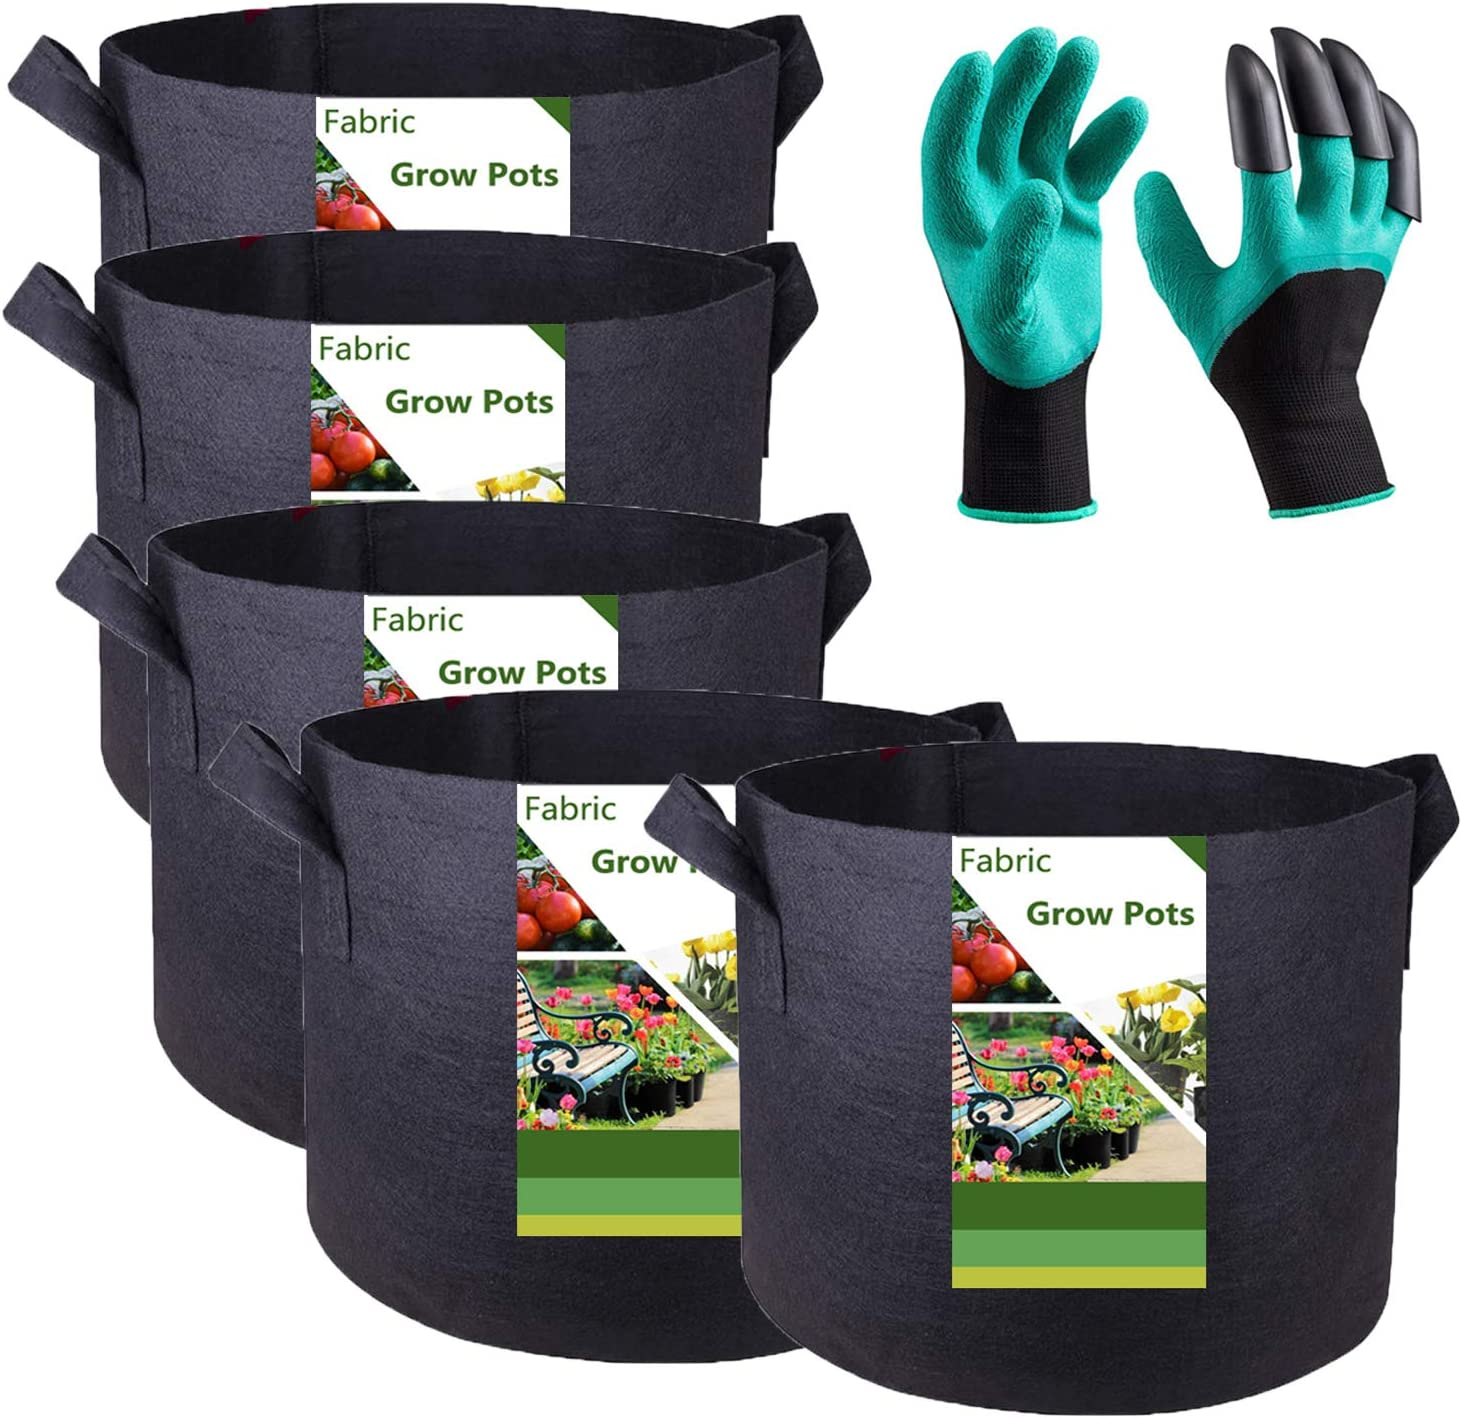 Tespher 5-Pack 100% quality warranty! 1 Popular brand Gallon Garden Grow Fabric Garde inch 7x6 Bags